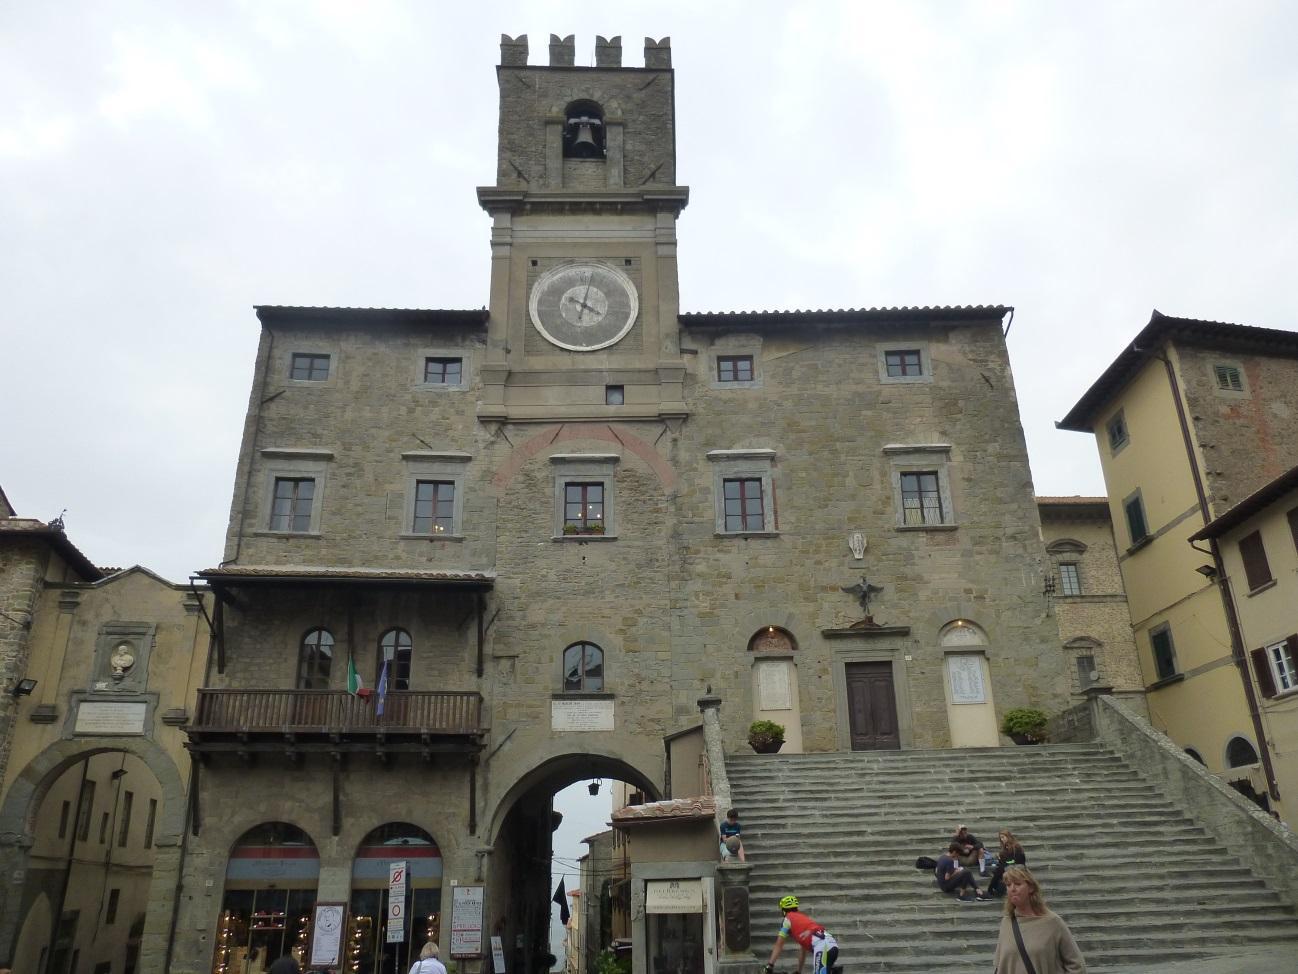 C:\Users\Gonzalo\Desktop\Documentos\Fotografías\La Toscana\103_PANA\103_PANA\P1030245.JPG